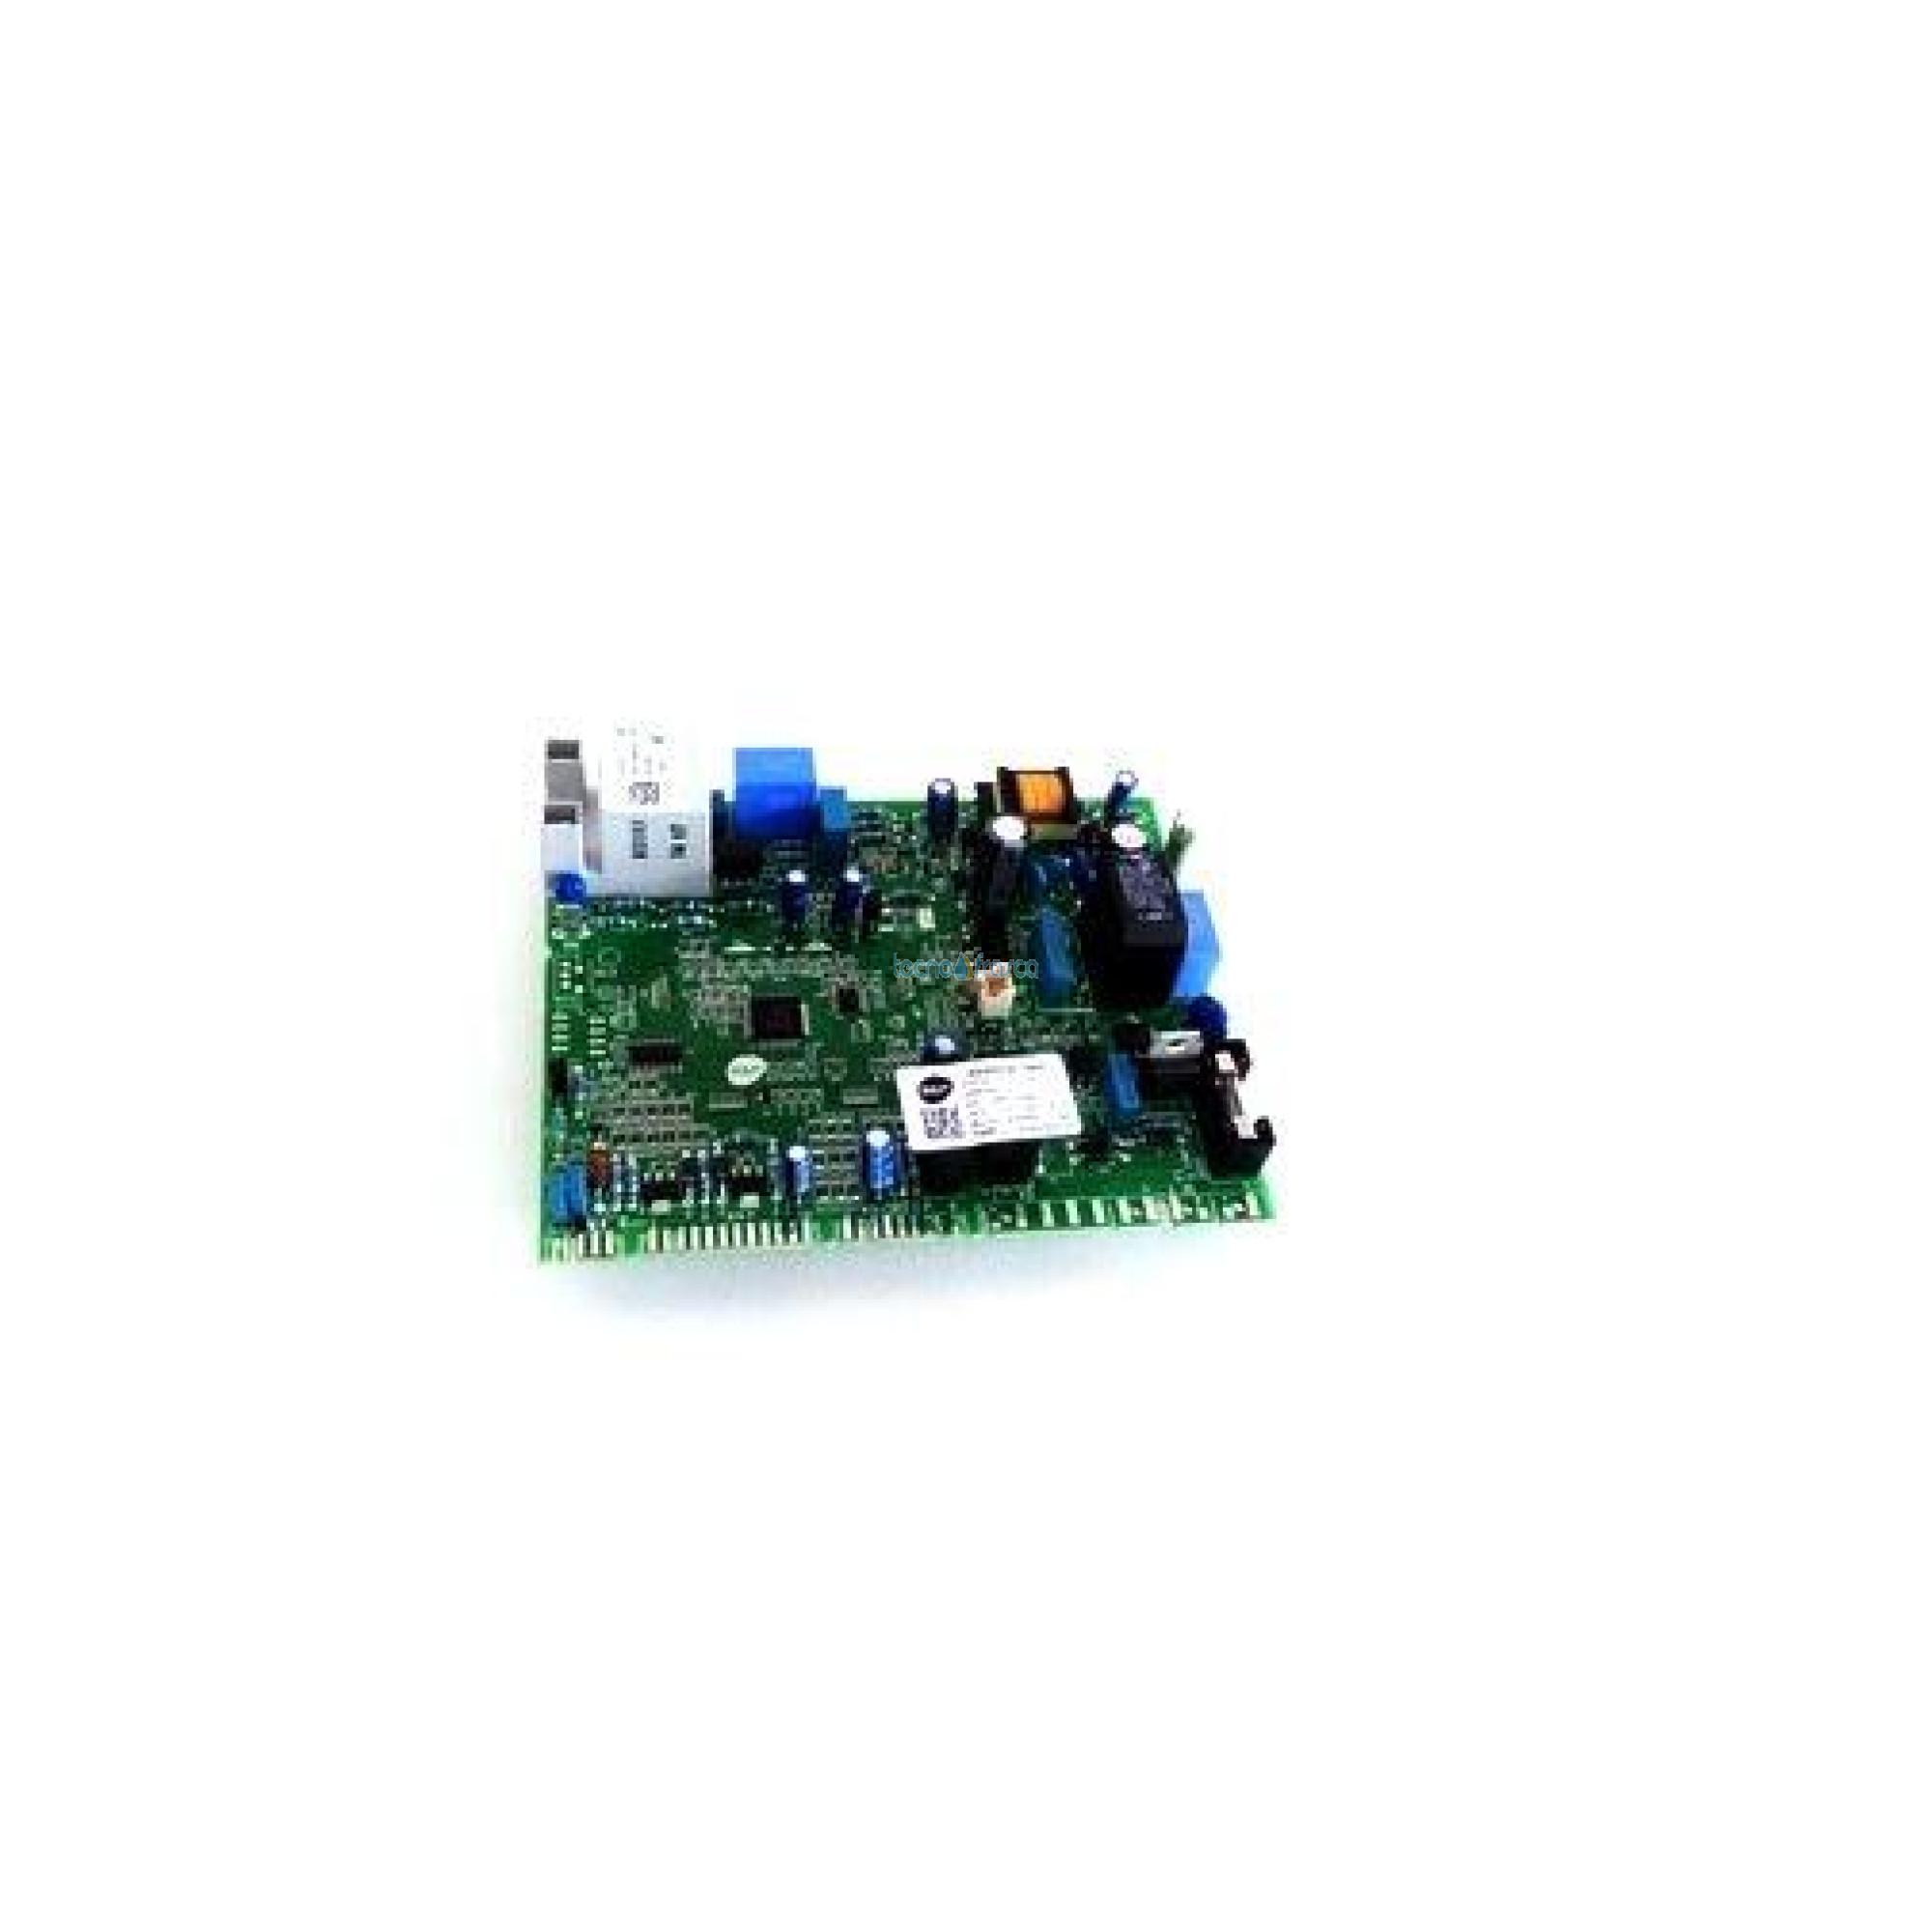 Savio biasi kit scheda integrata b&p m296 dgt bi2285109